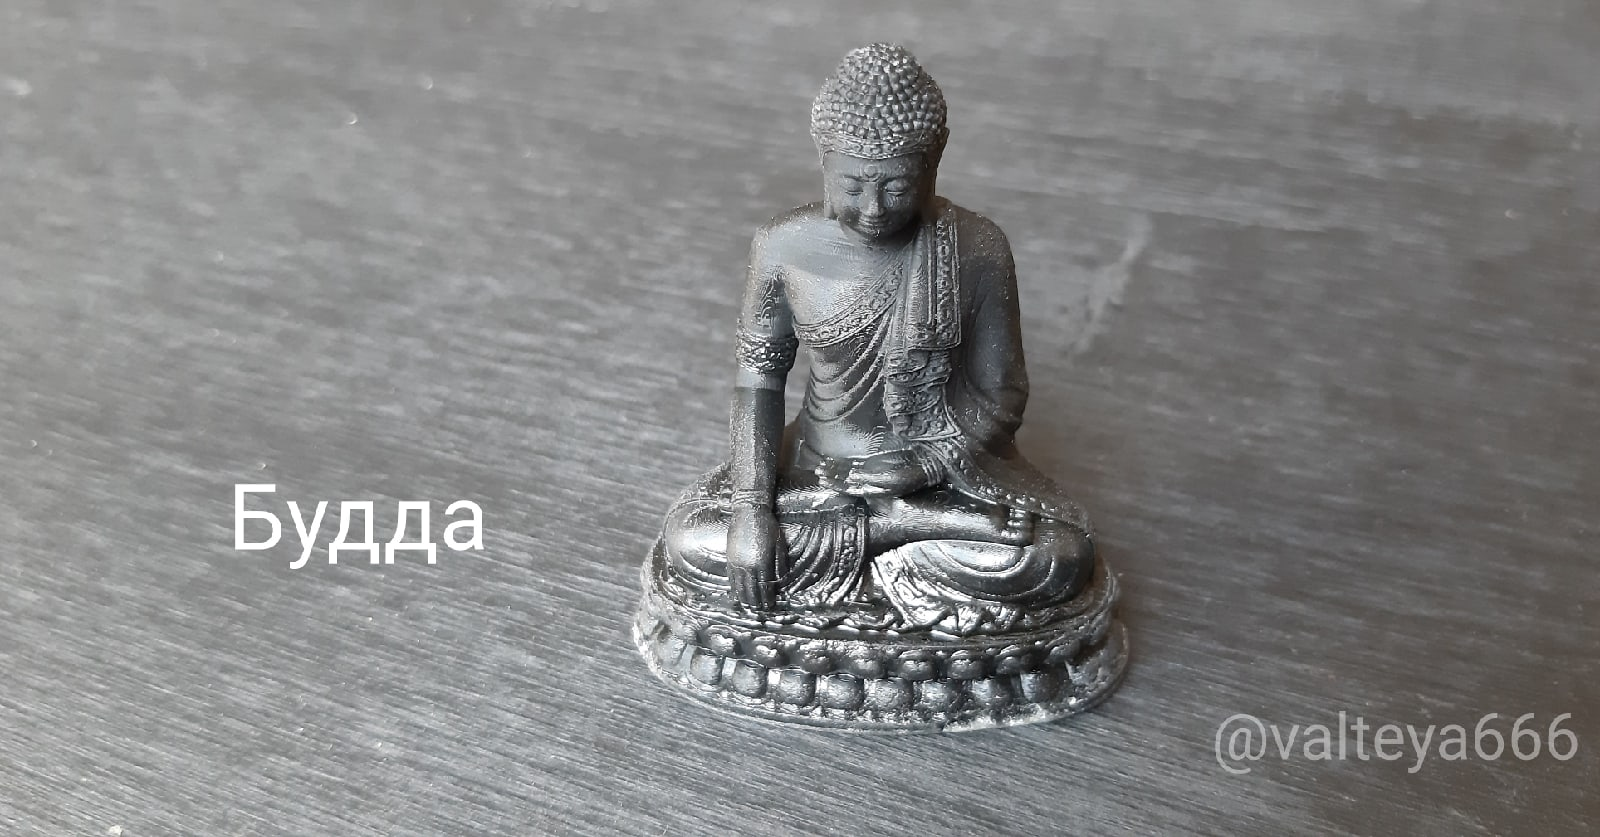 Хештег Будда на   Салон Магии и мистики Елены Руденко ( Валтеи ). Киев ,тел: 0506251562  LZVIqBbWtus